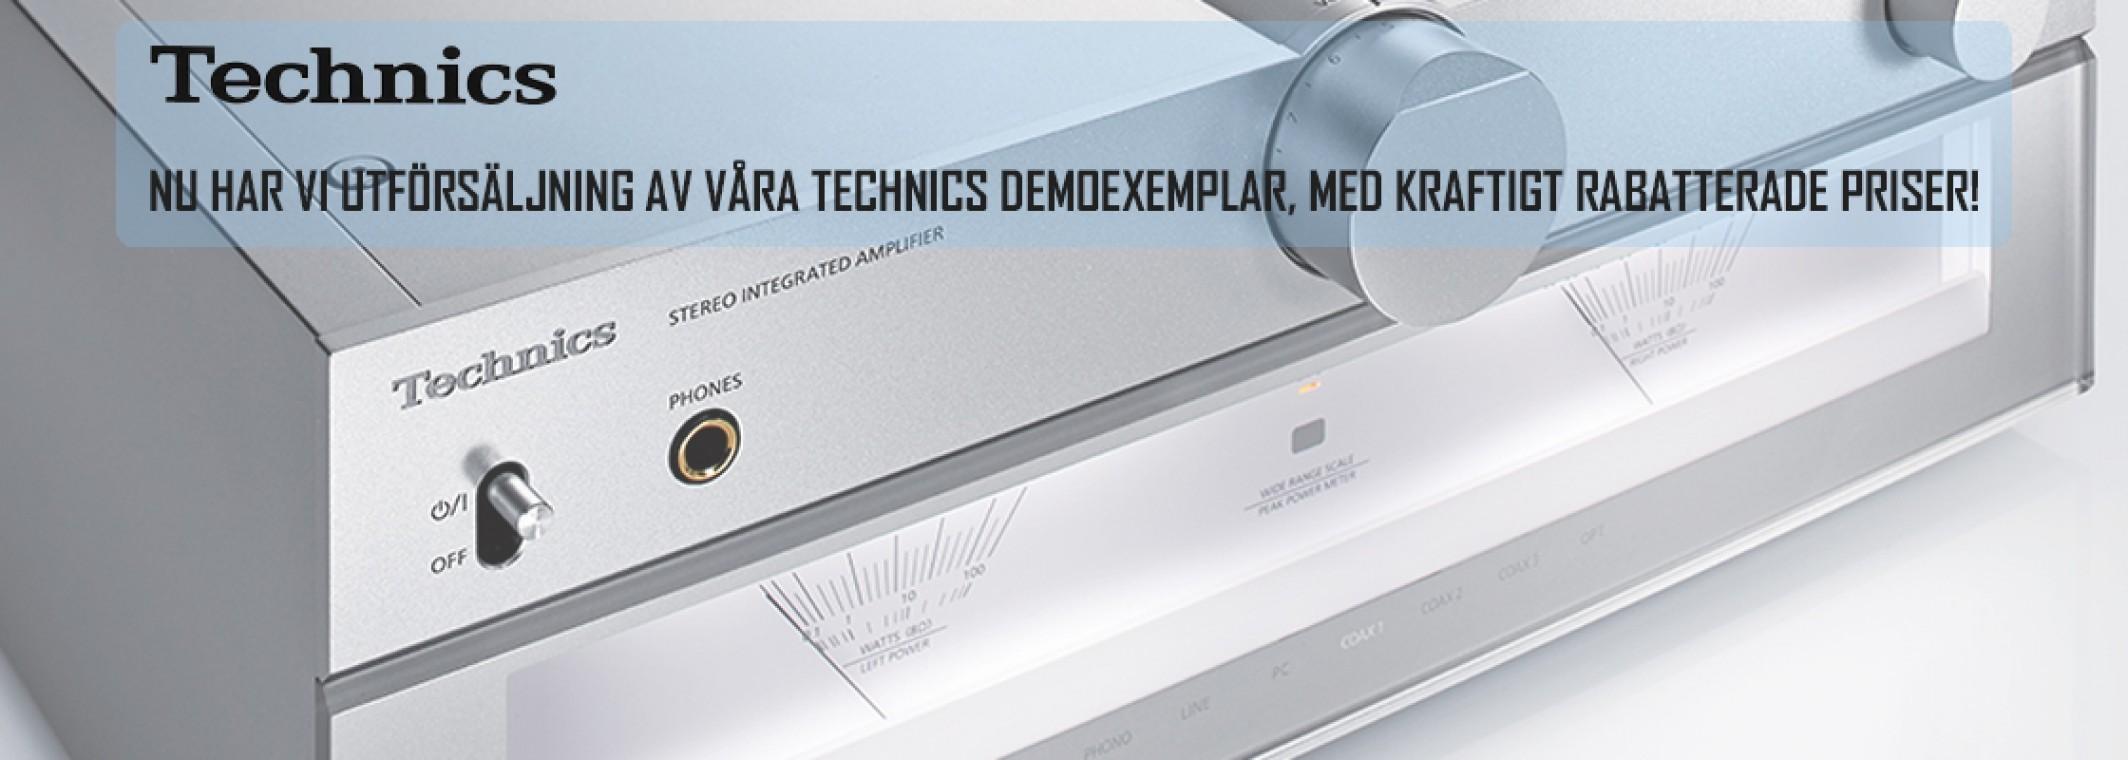 utforsaljning_technics_demoex.jpg